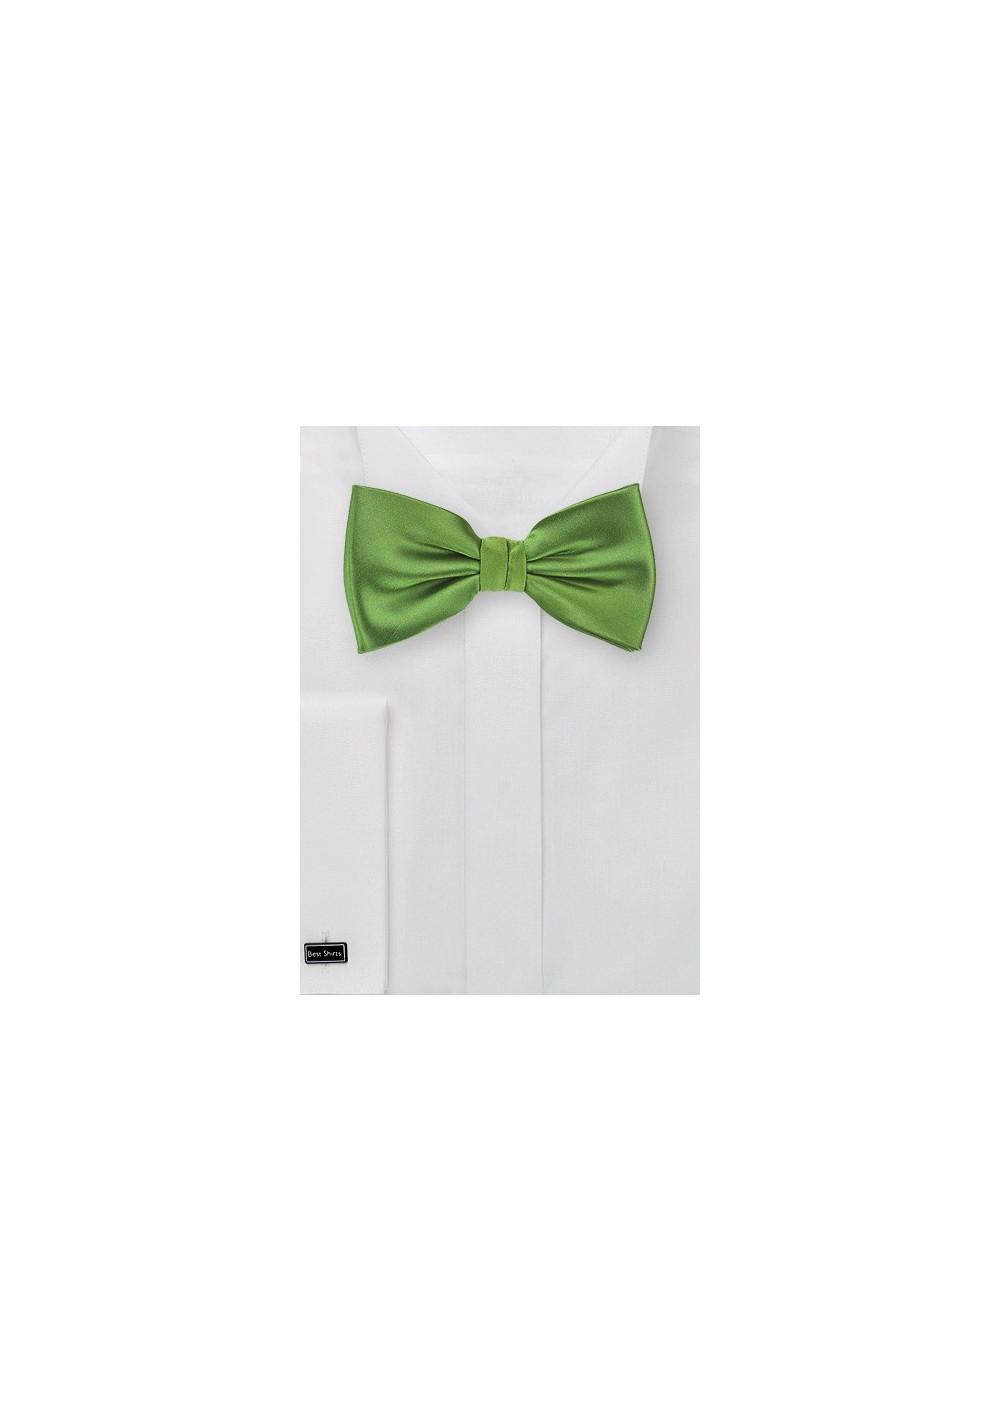 Fern Green Bow Tie